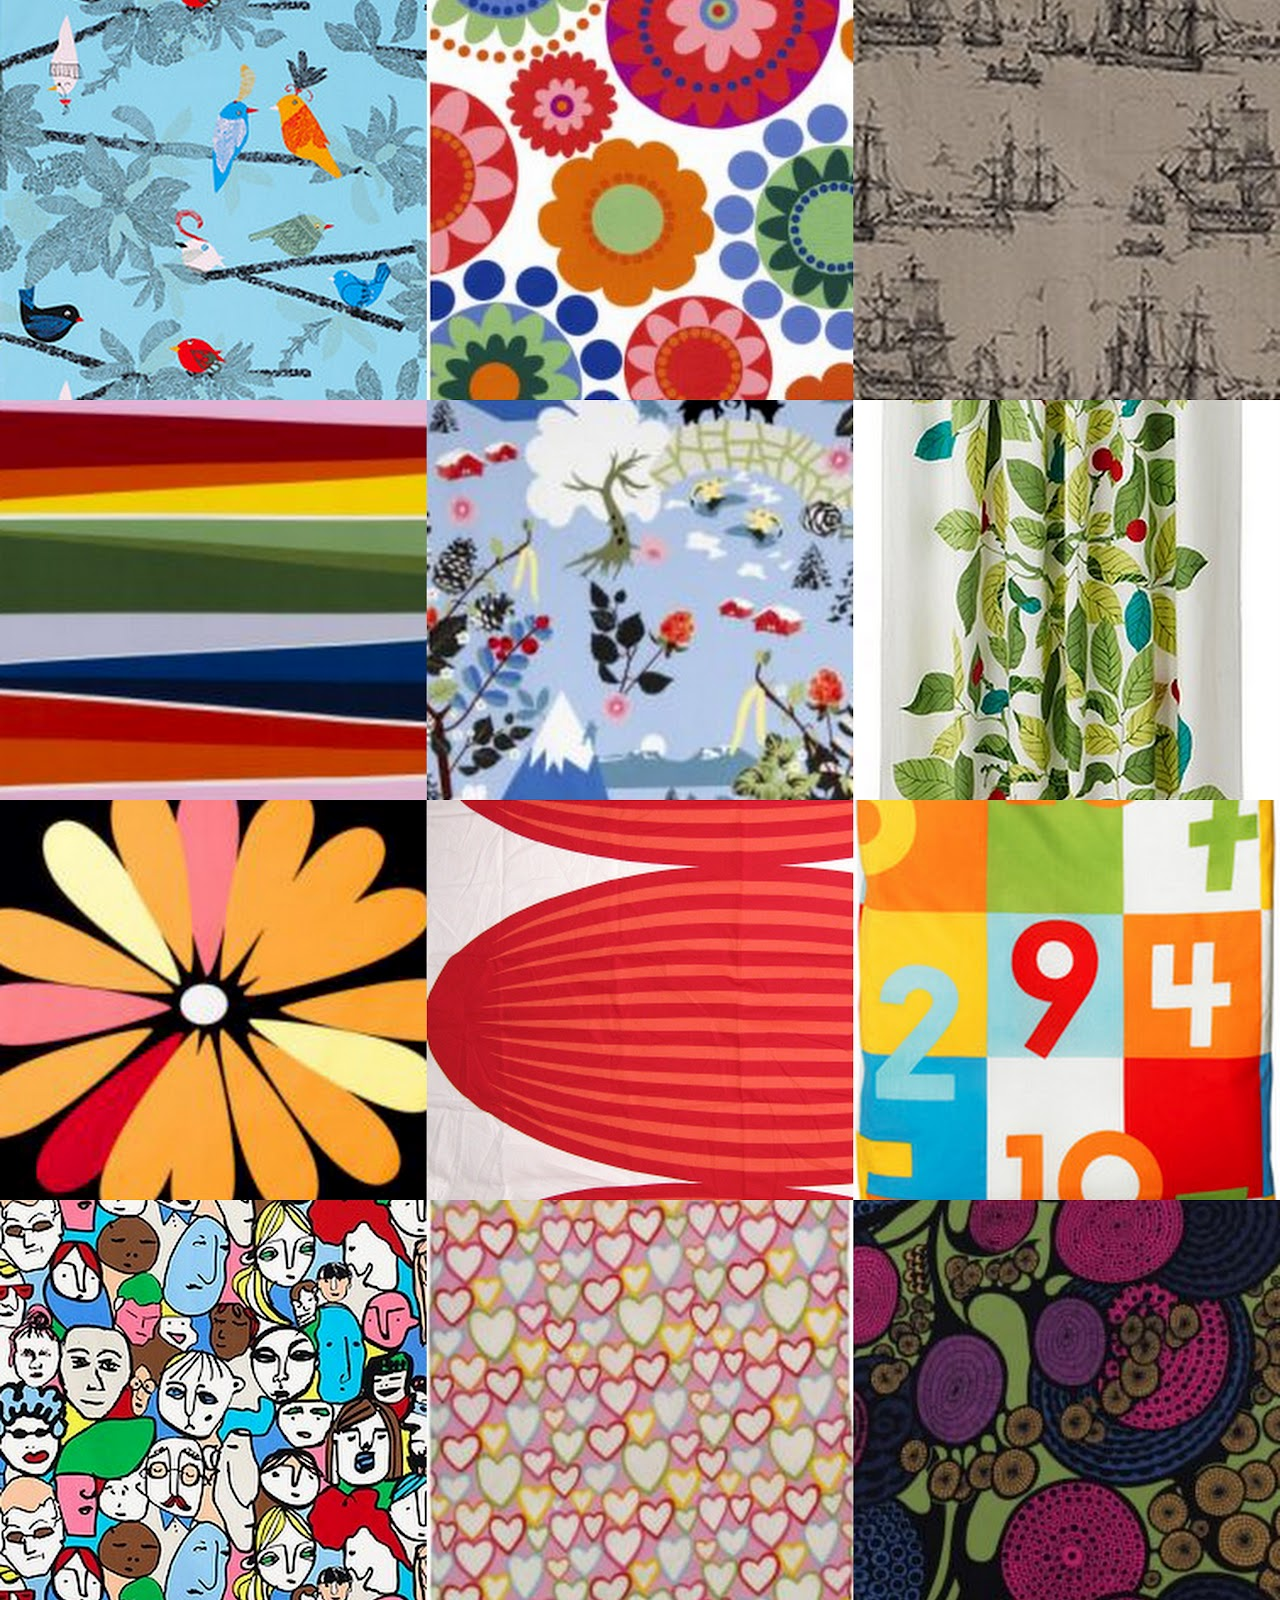 Amongst The Knick-knacks: Textile Tuesday: Ikea Edition